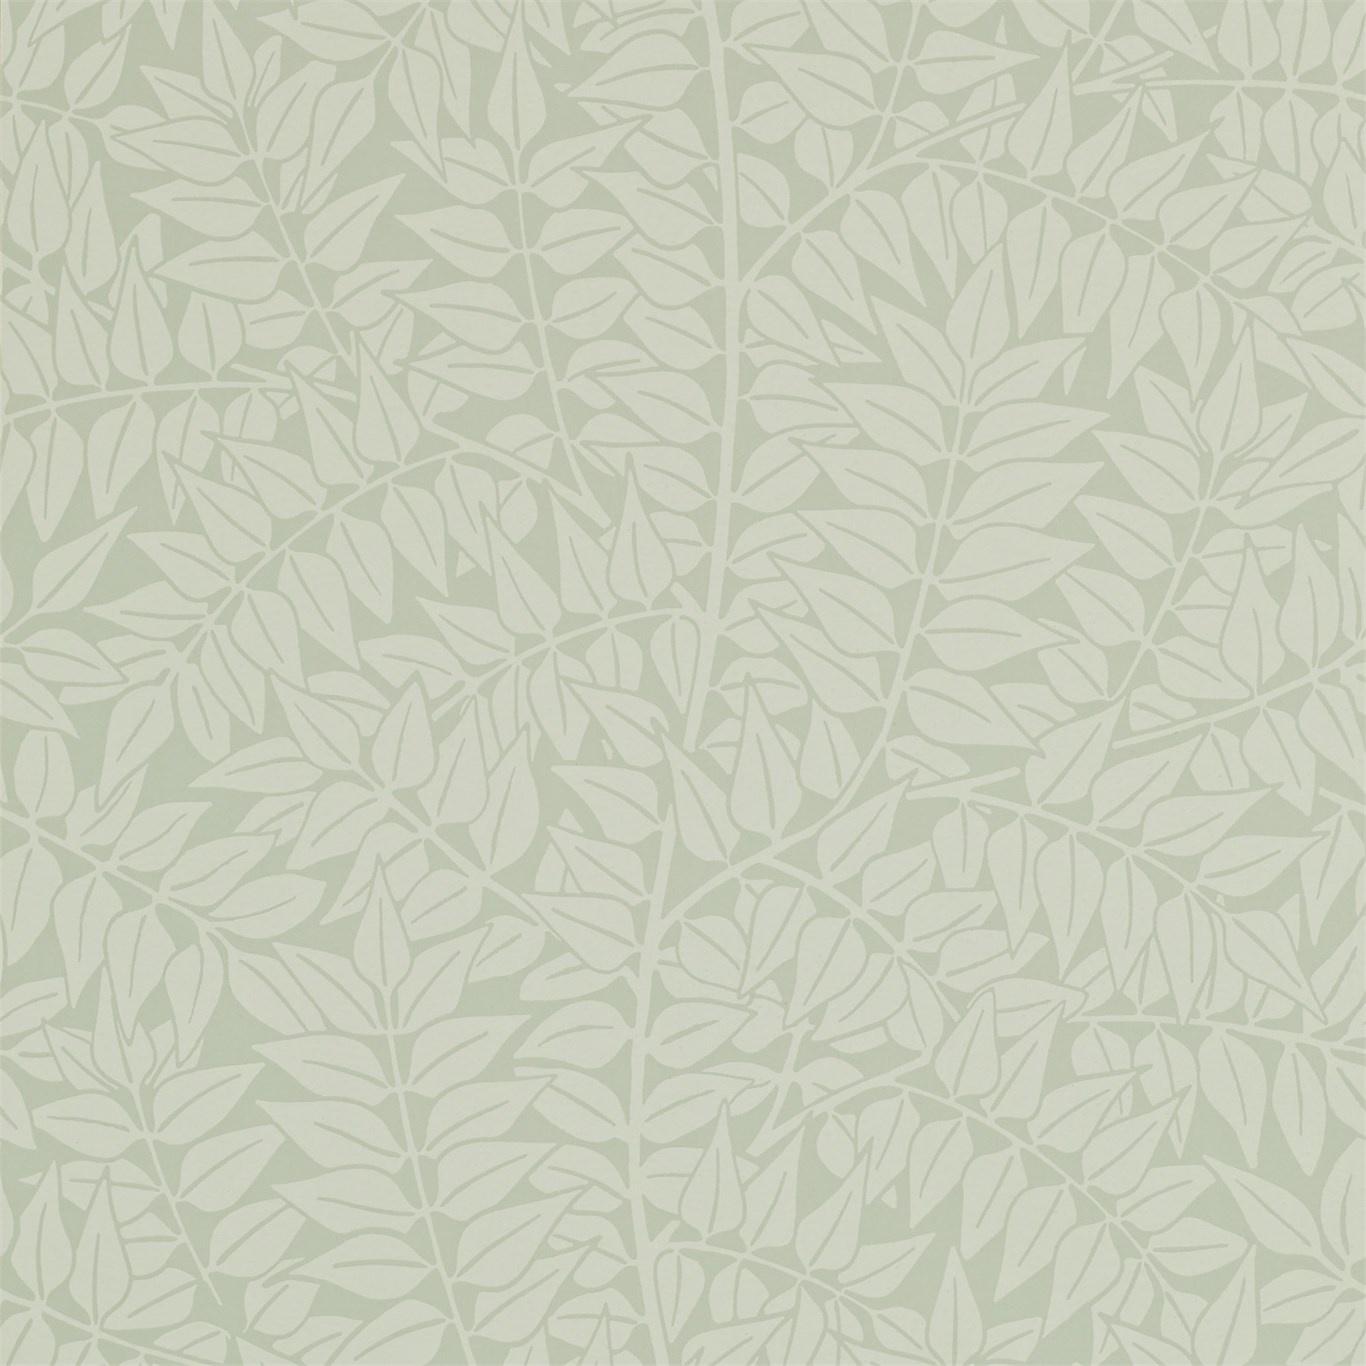 Image of Morris & Co Branch Sage Wallpaper 210375